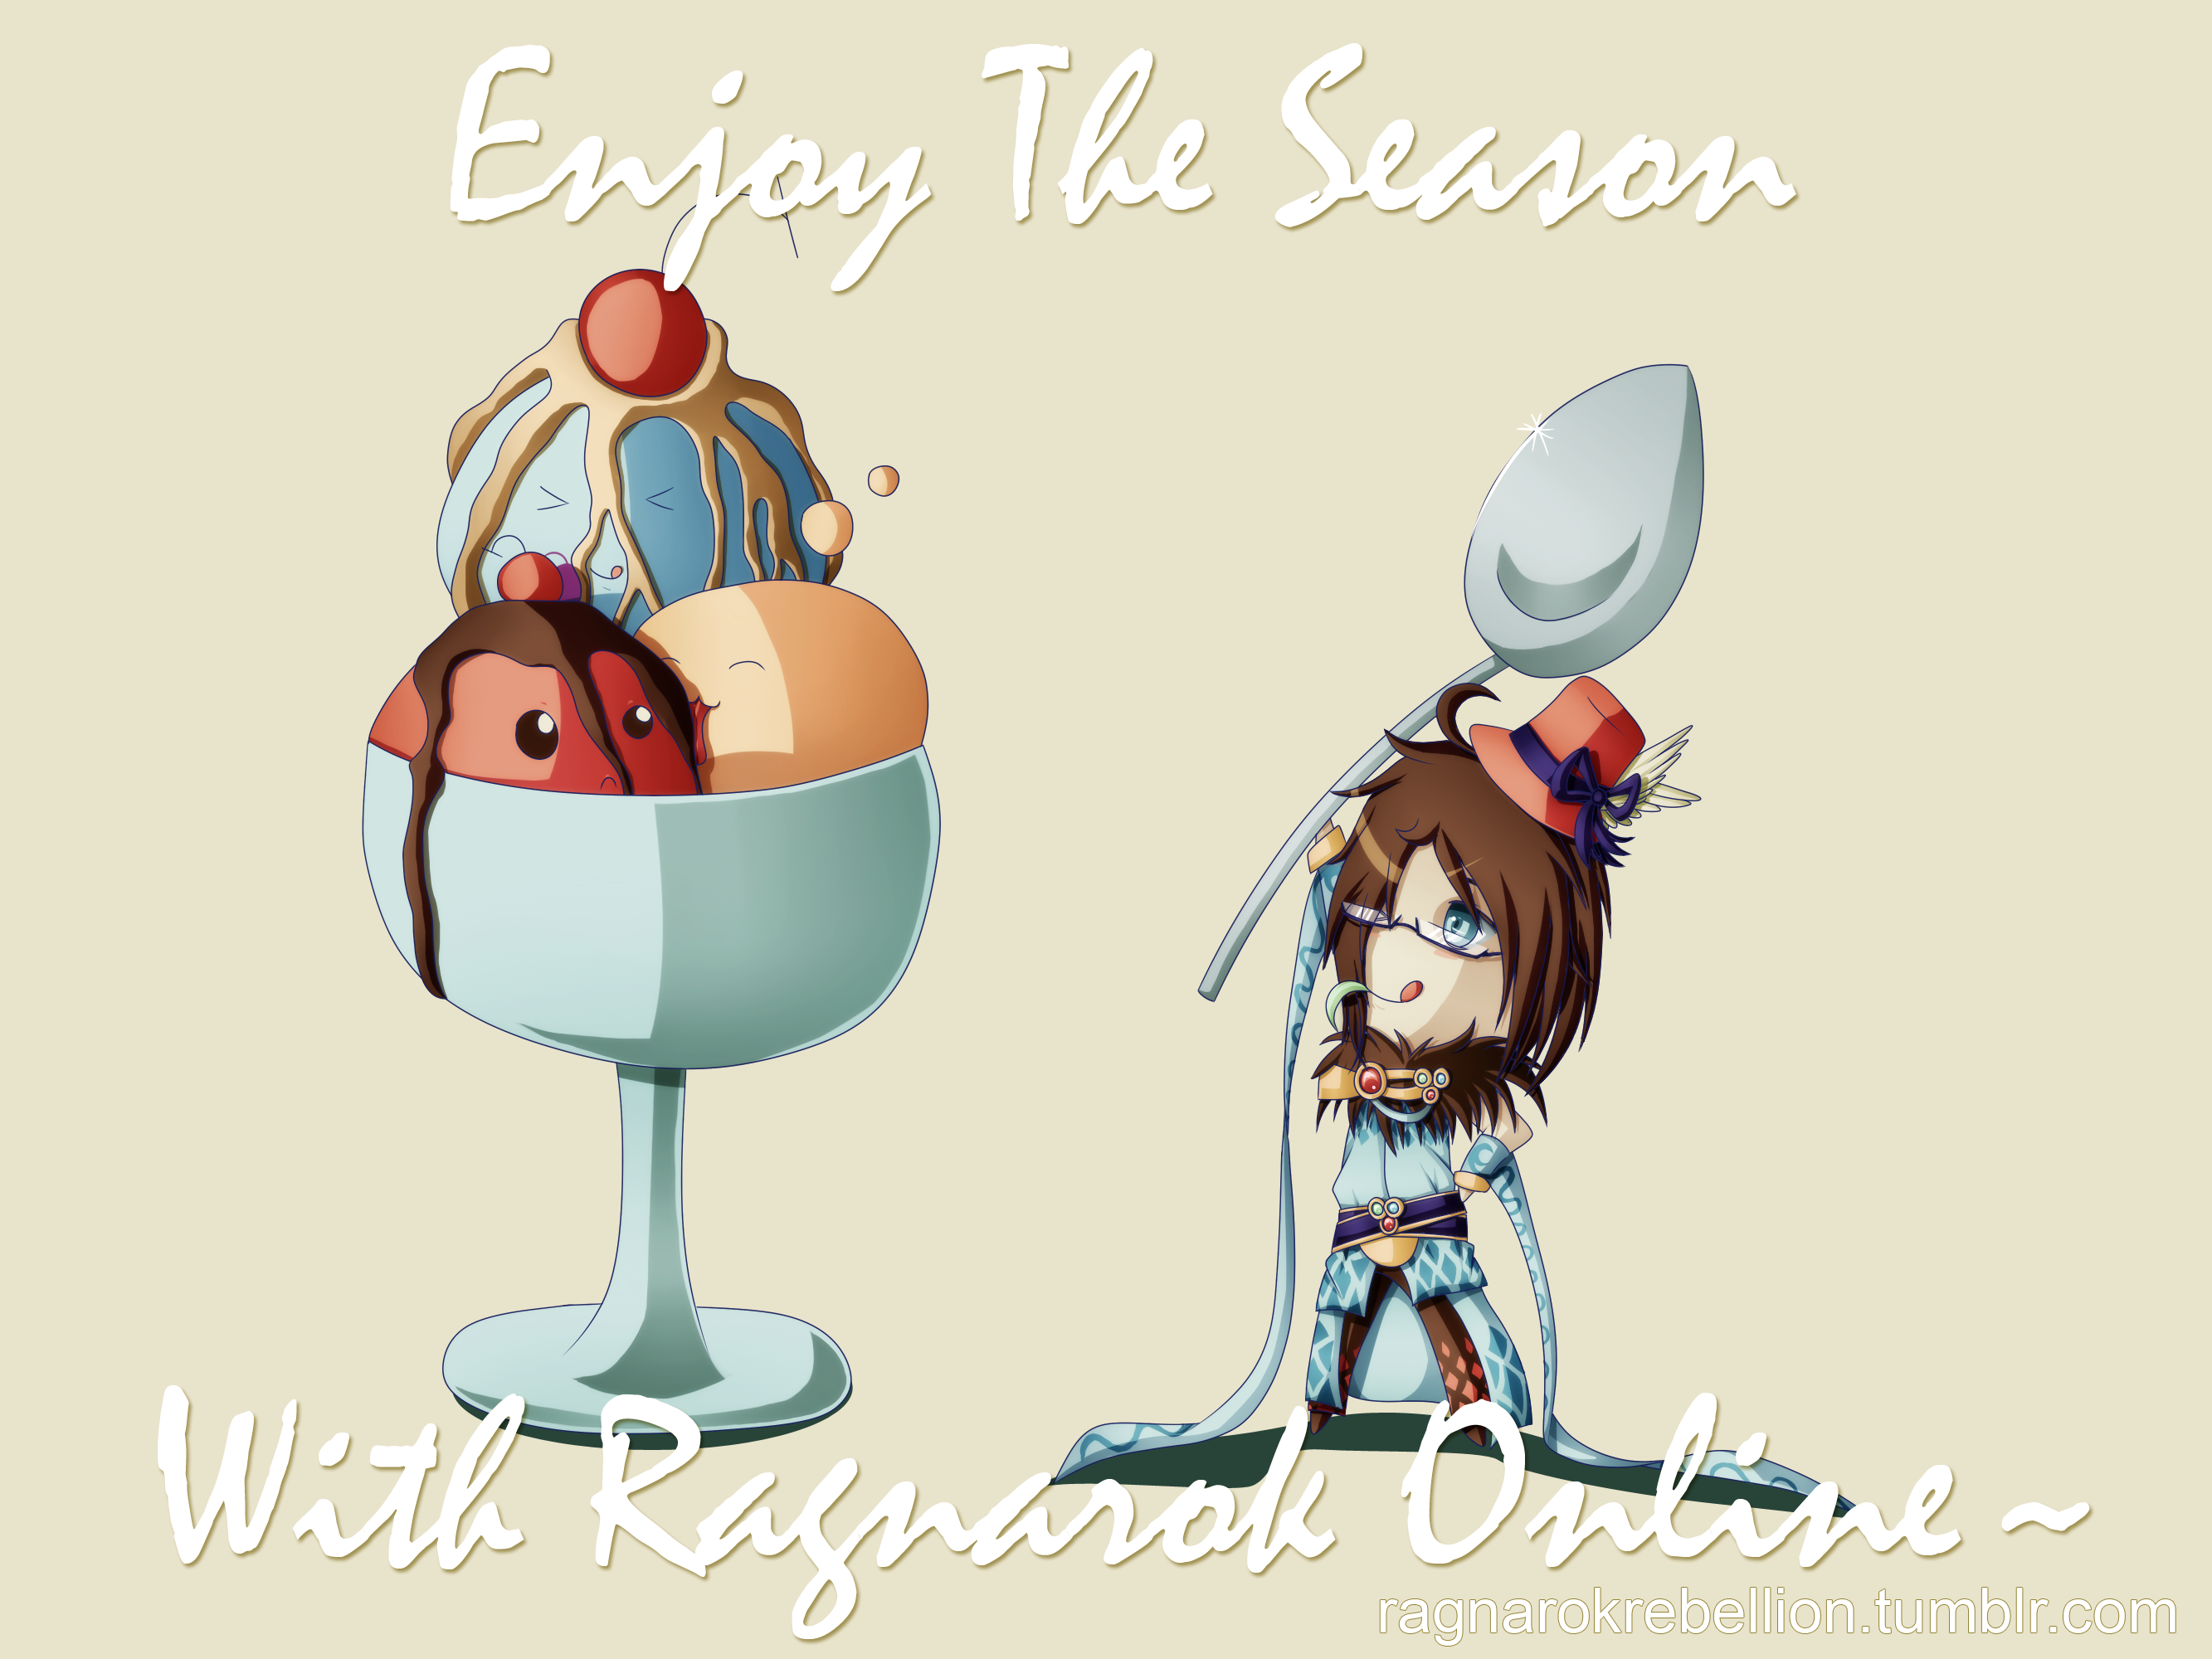 ice_creams_by_deathbydarkness-d7urqg7.pn